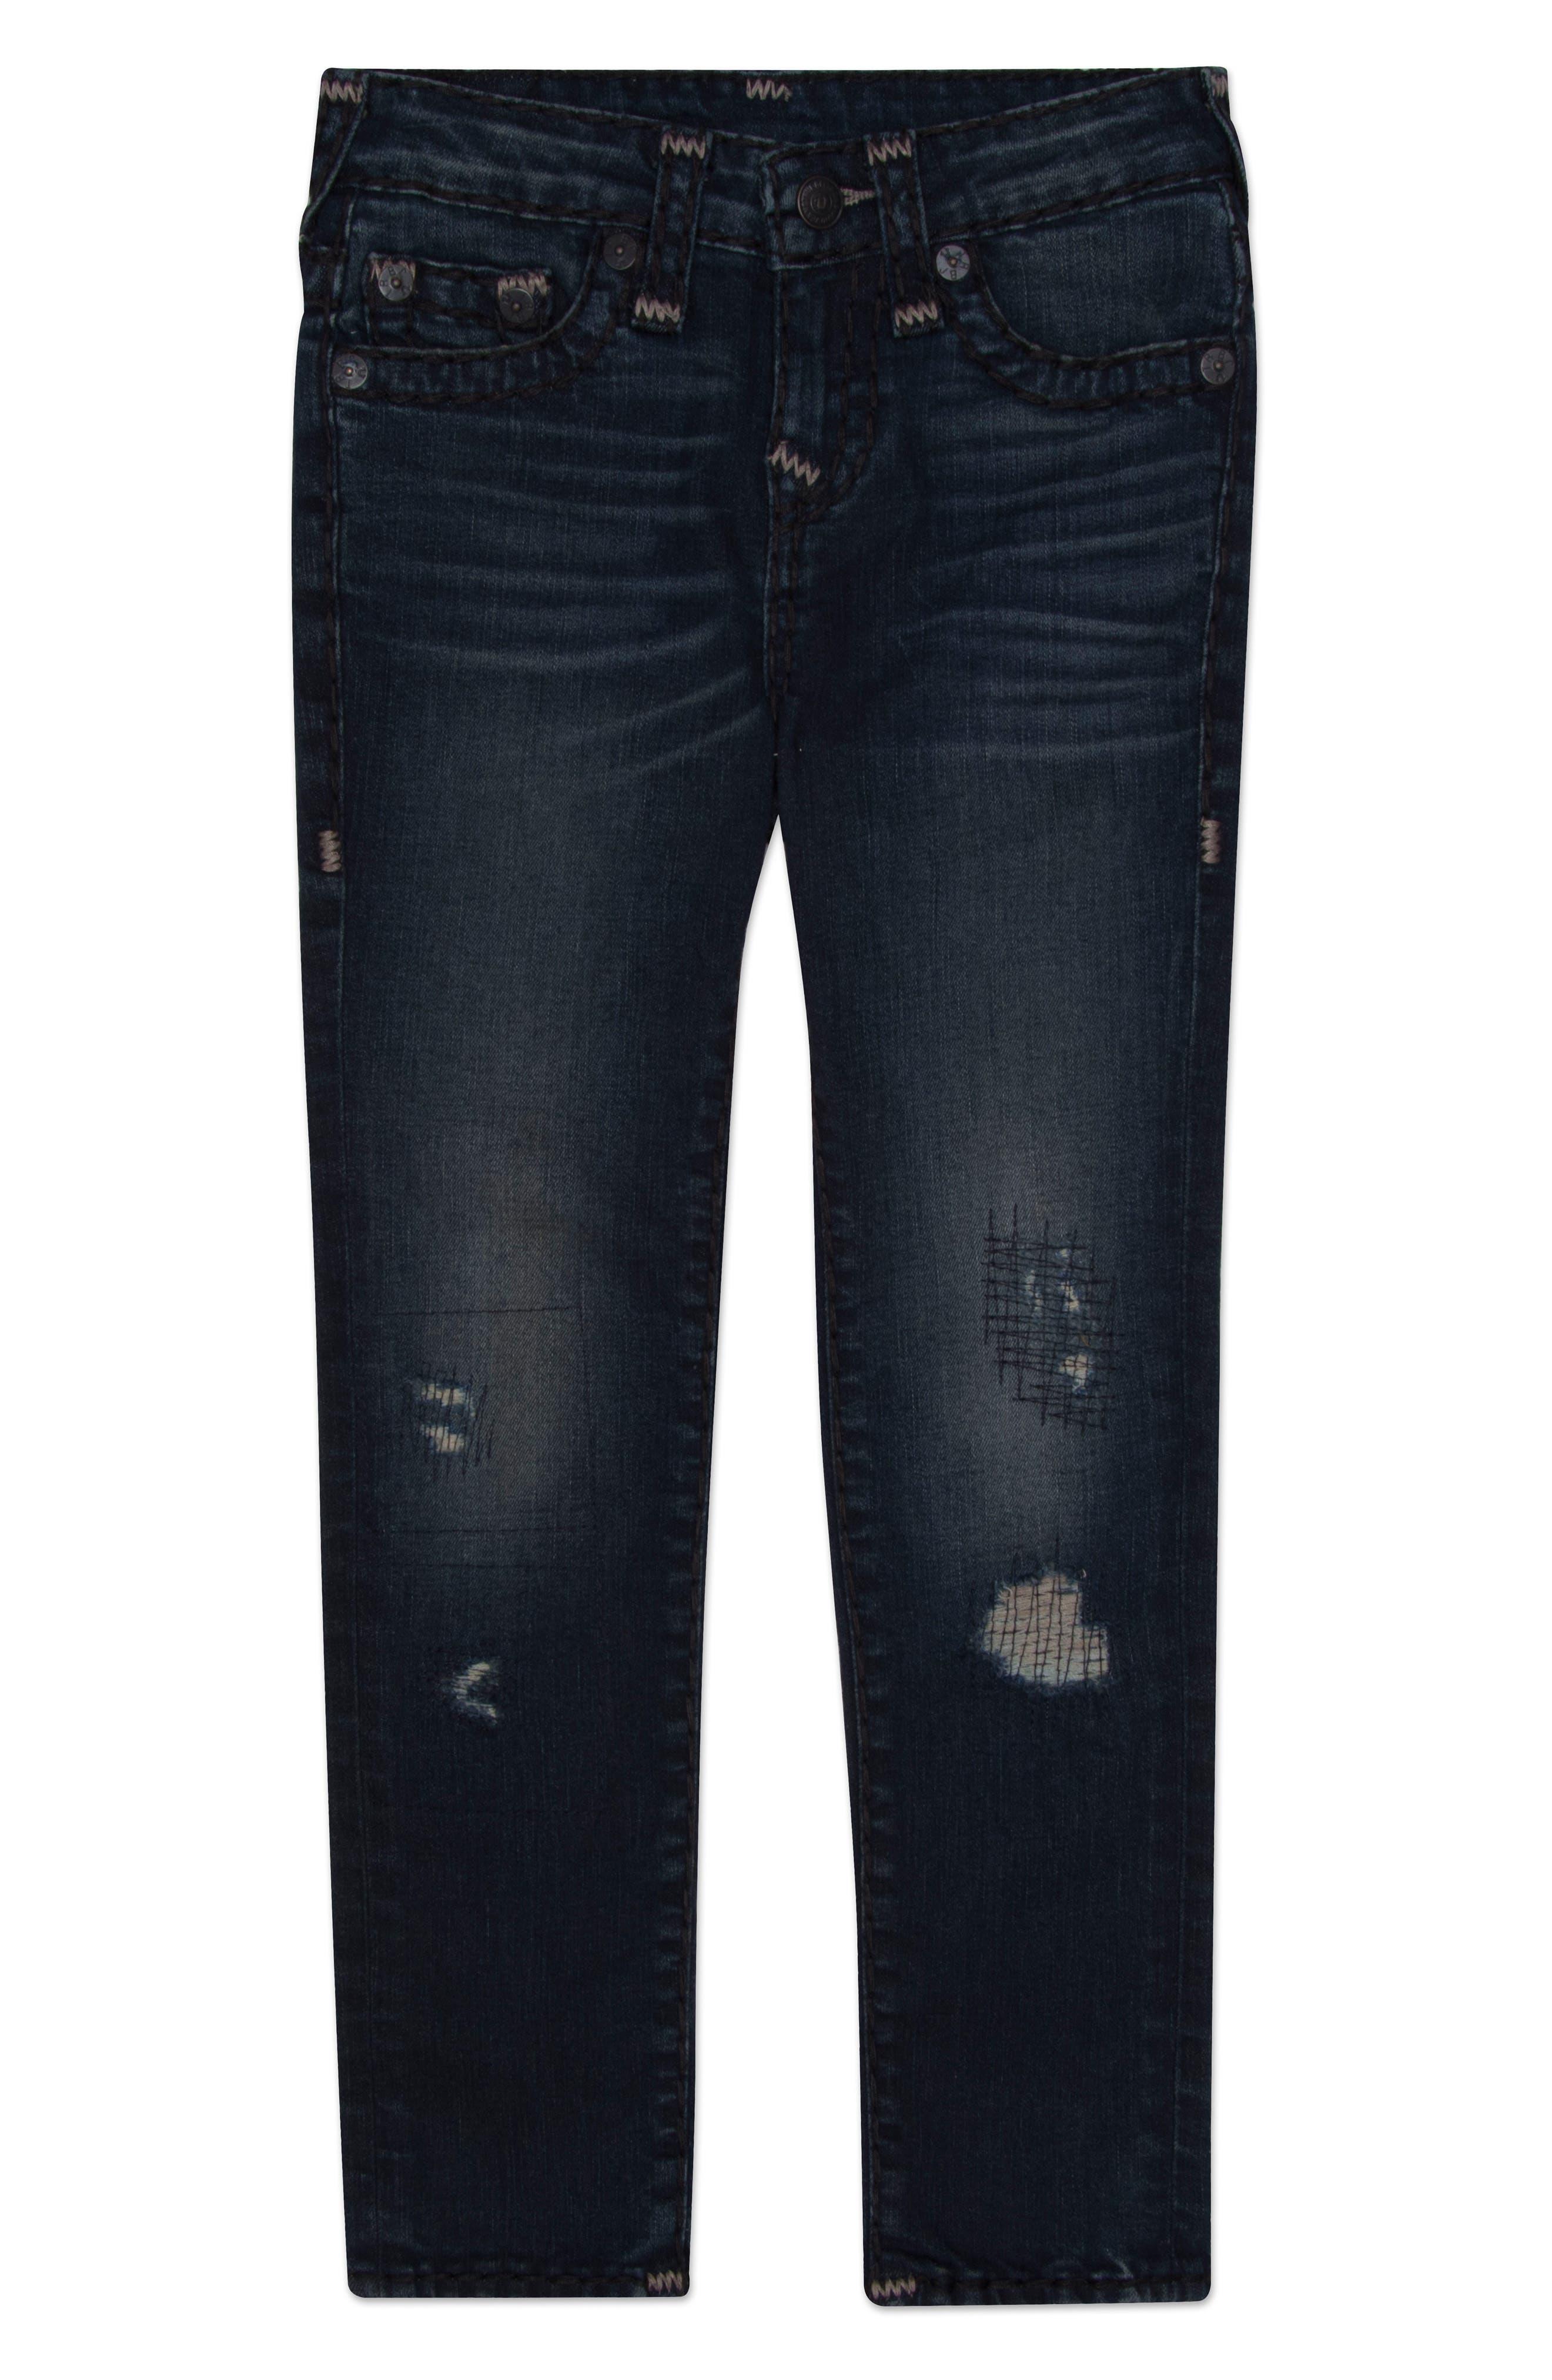 Alternate Image 1 Selected - True Religion Brand Jeans Geno Super T Jeans (Toddler Boys, Little Boys & Big Boys)